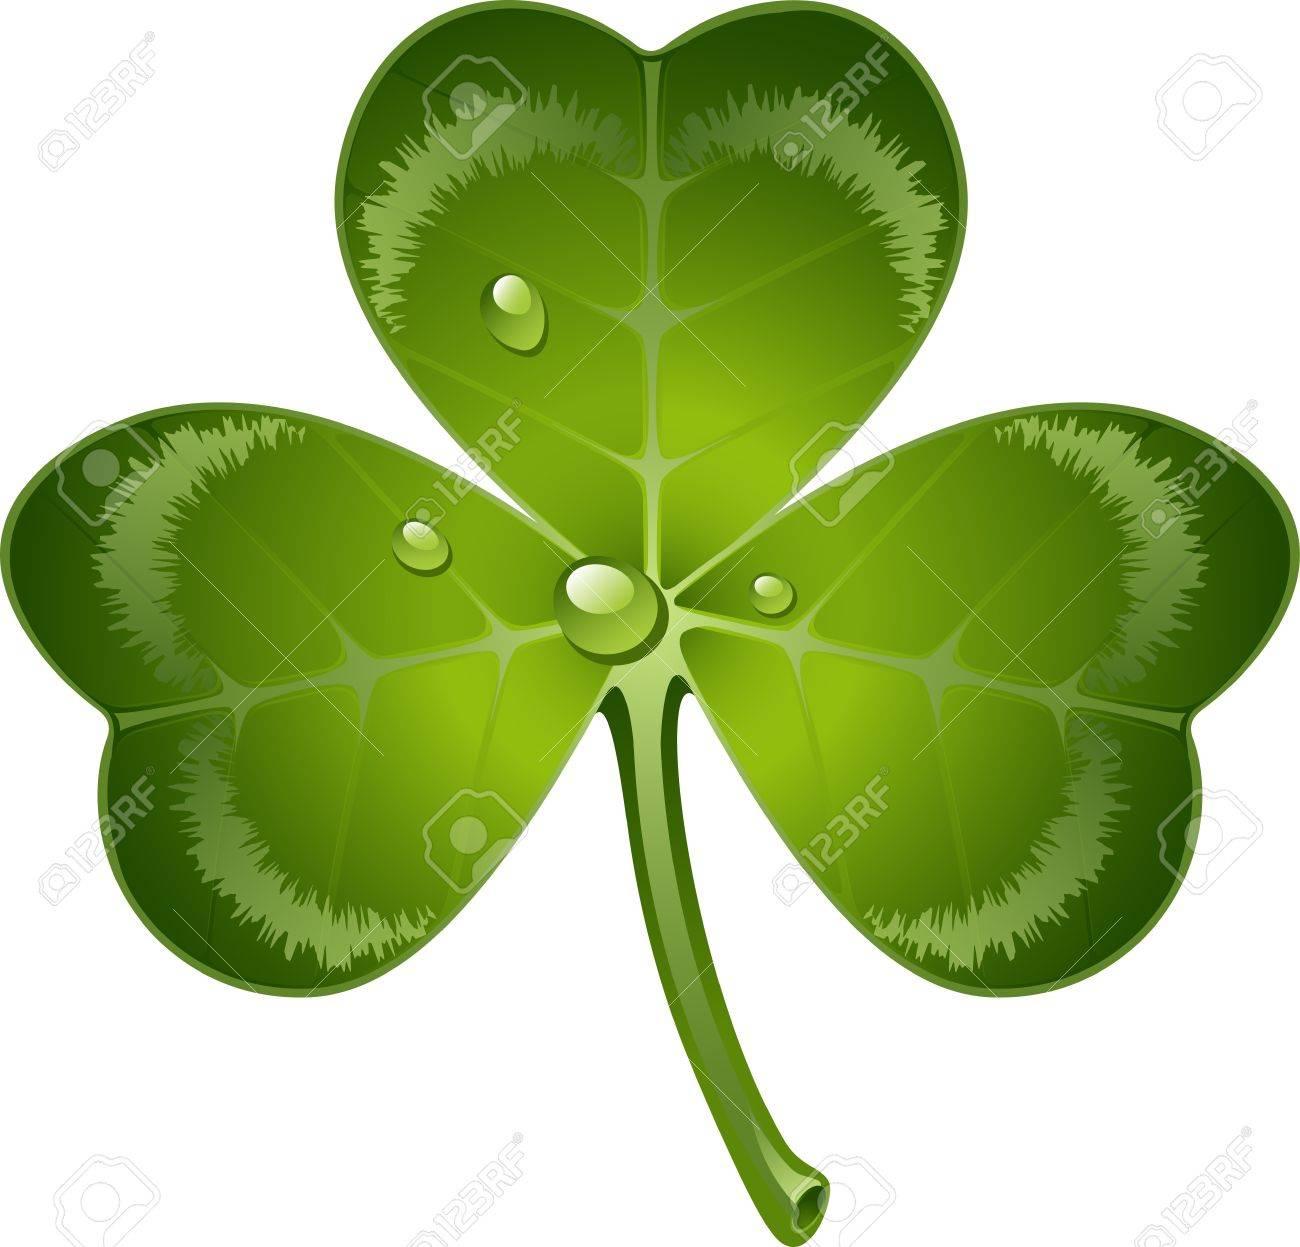 clover leaf over white. Stock Vector - 12284513